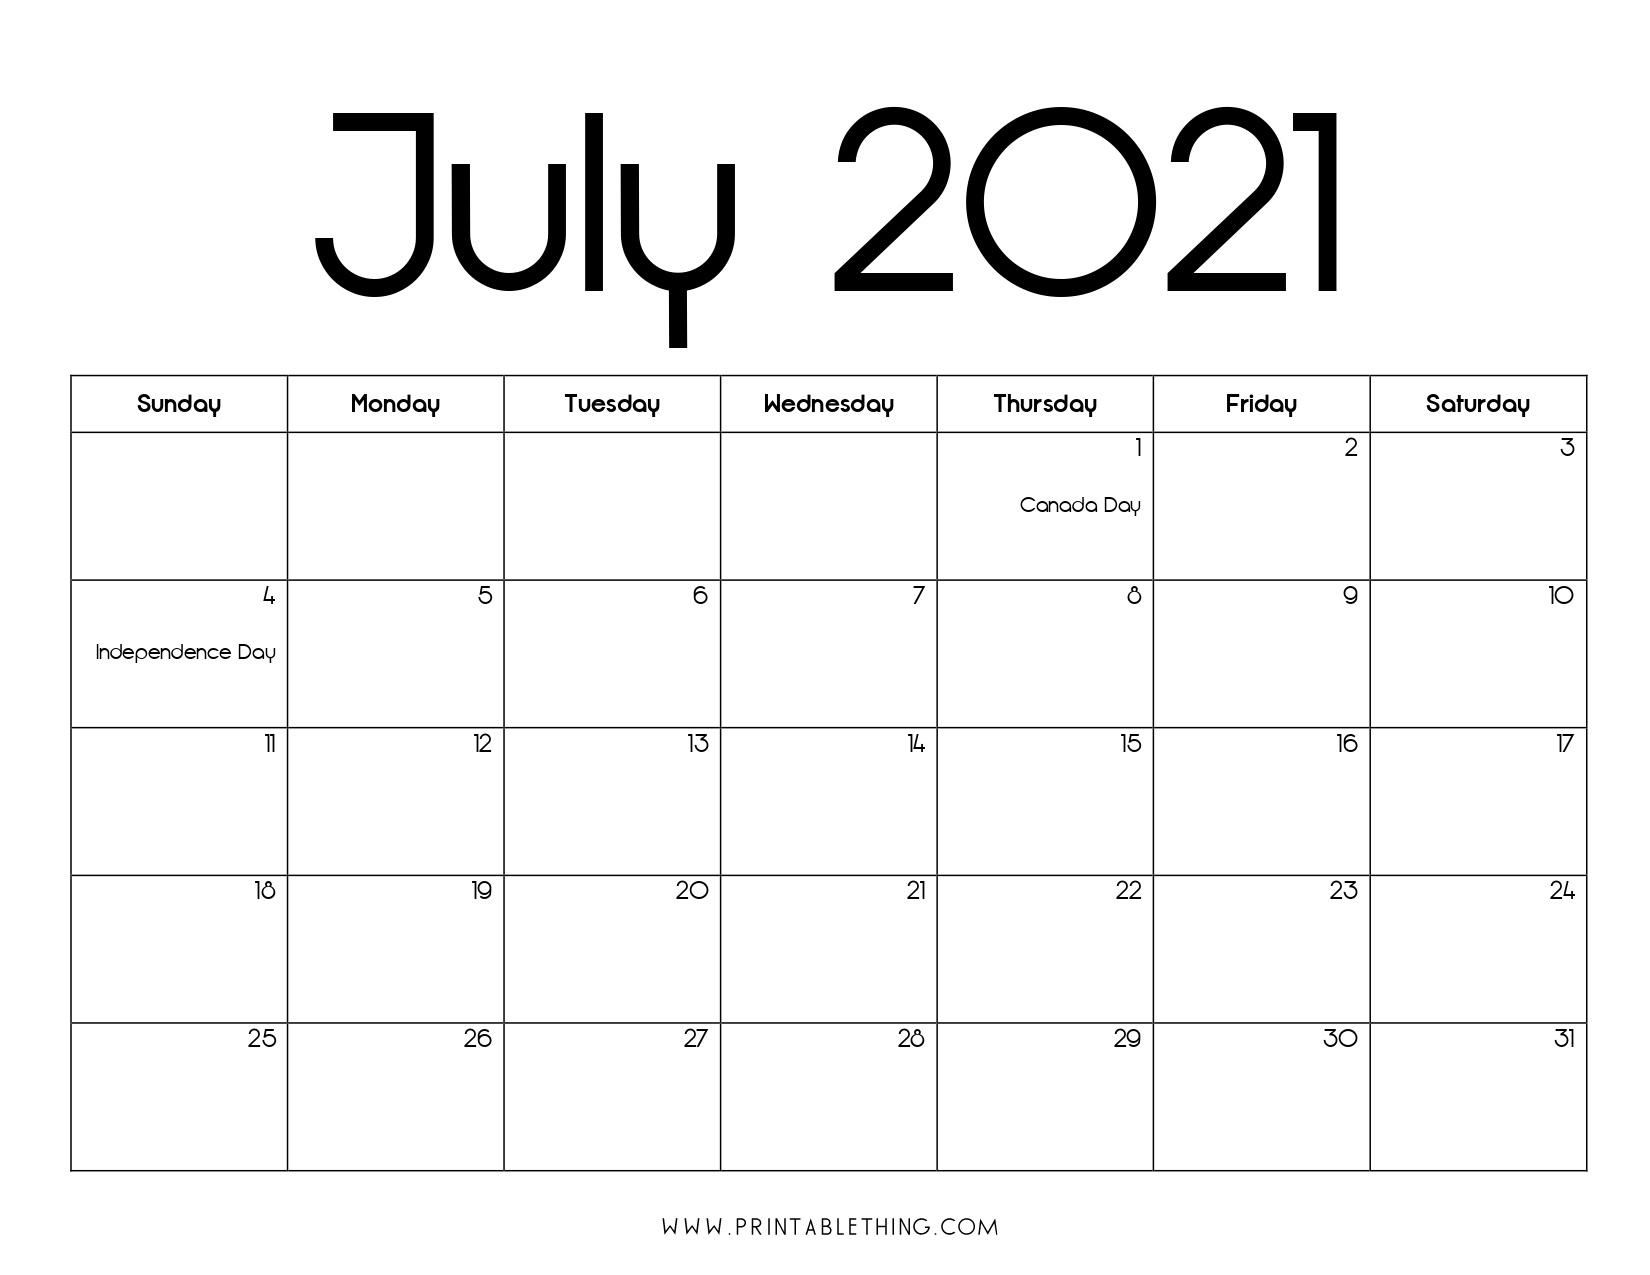 July 2021 Calendar Pdf, July 2021 Calendar Image, Print Pdf & Image Printable July And August 2021 Calendar